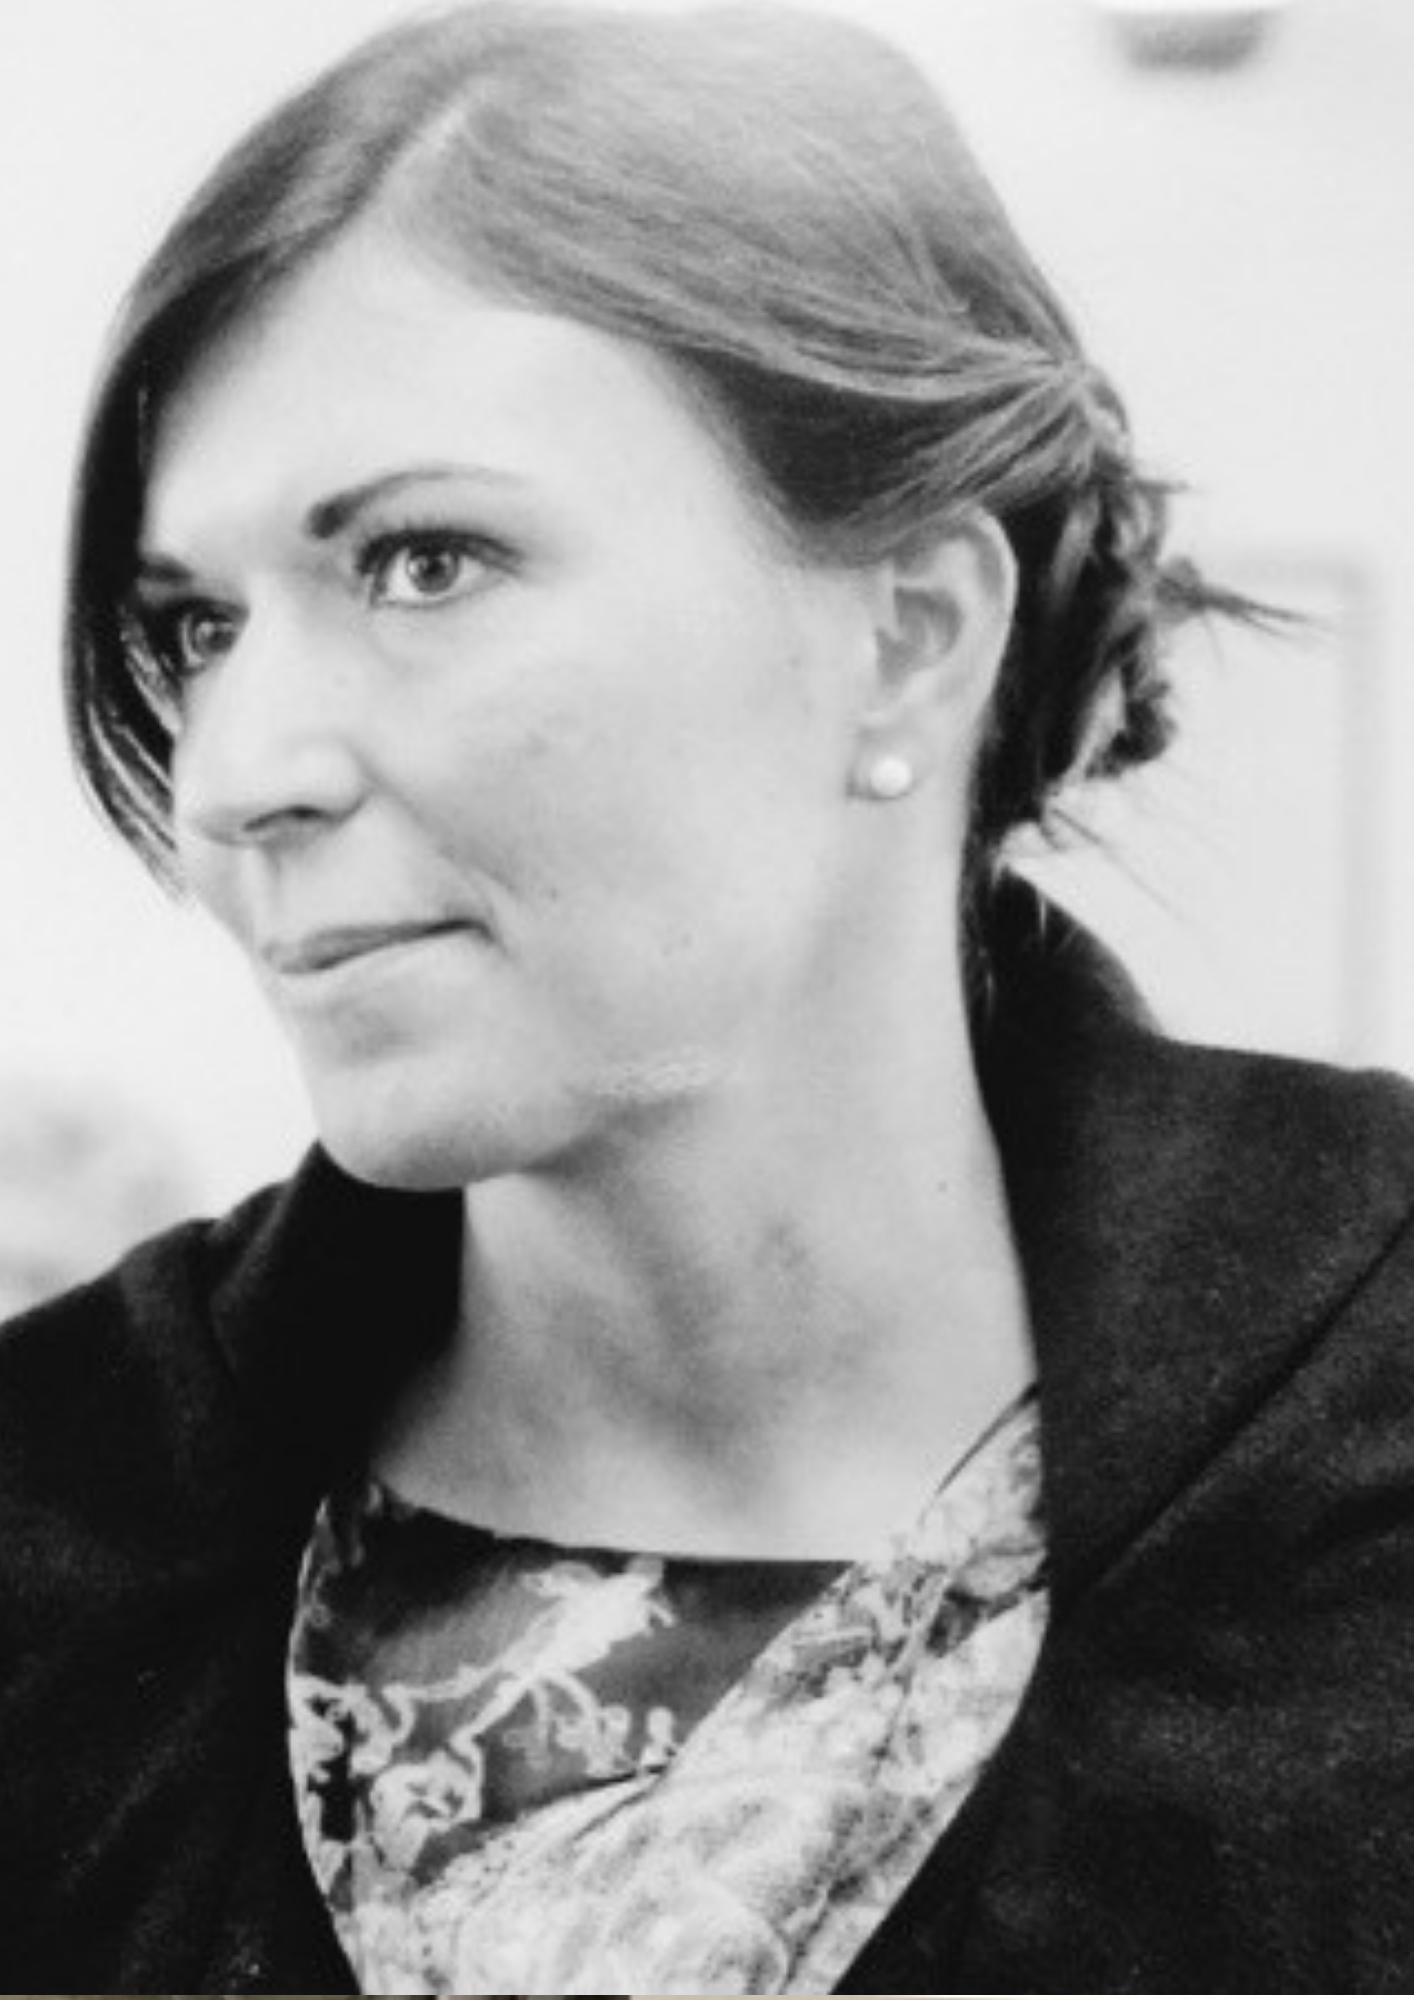 Dott.ssa Alessandra Merisio